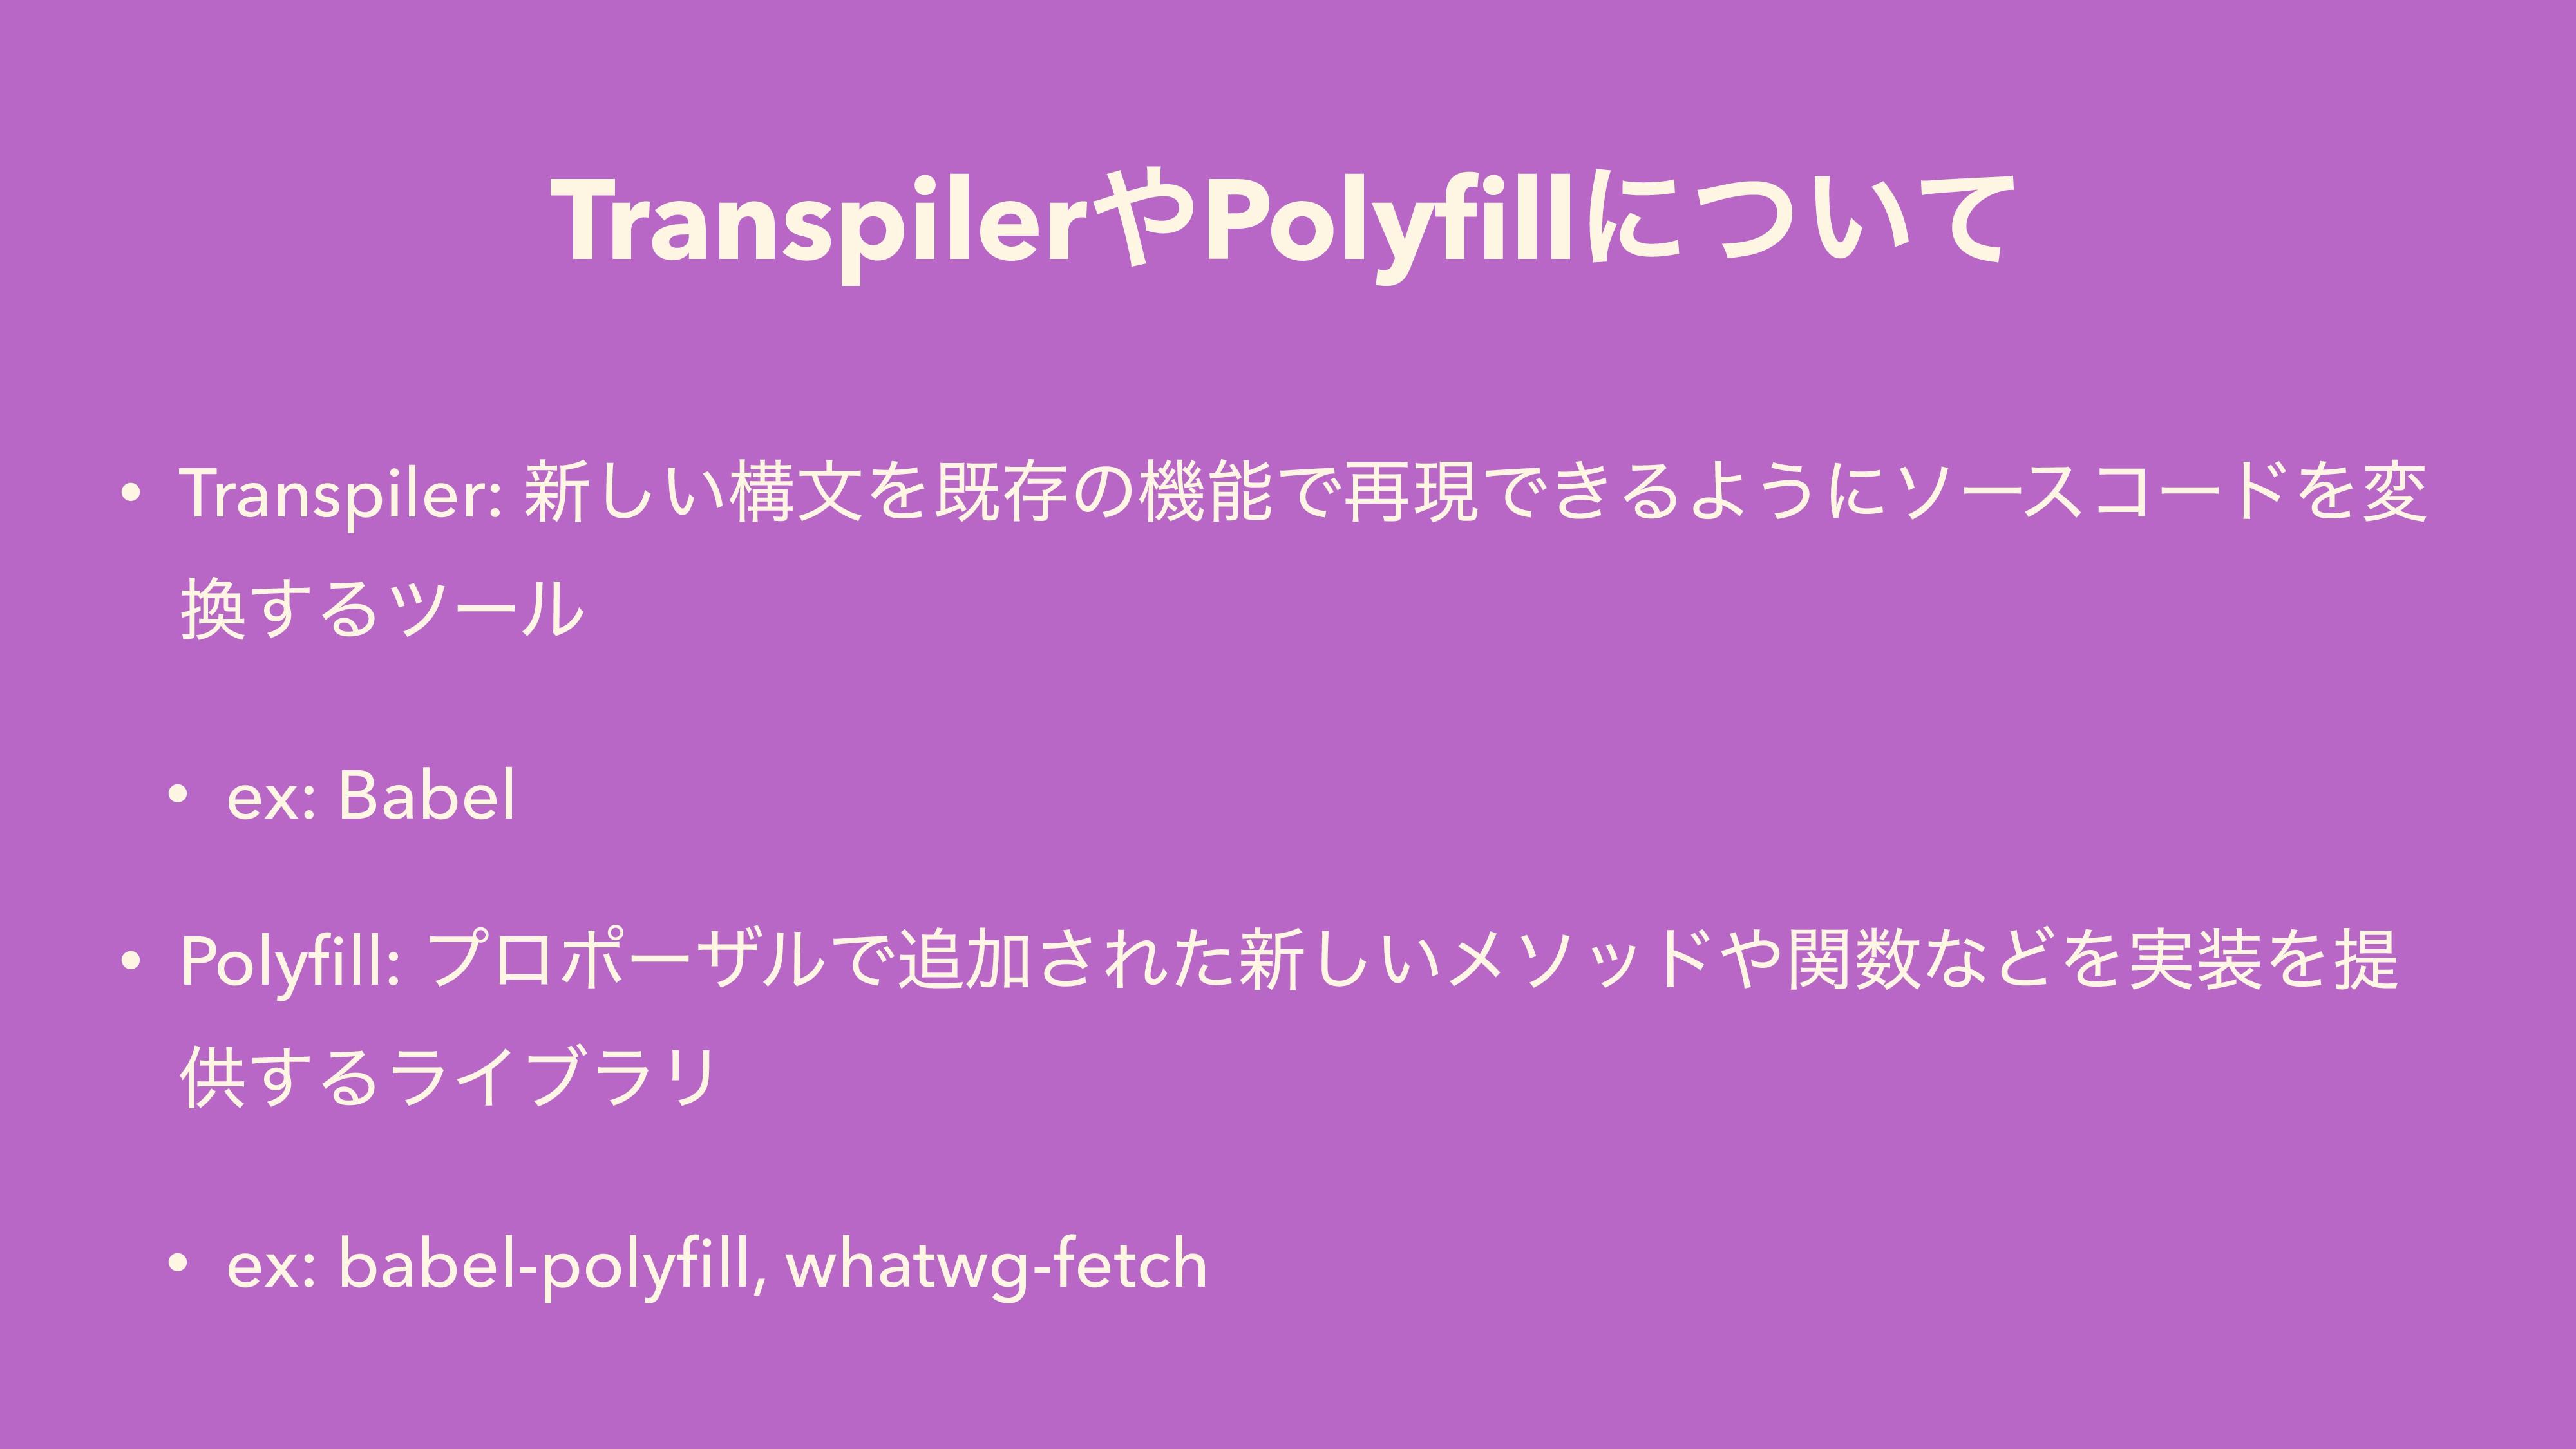 TranspilerPolyfillʹ͍ͭͯ • Transpiler: ৽͍͠ߏจΛطଘͷػ...